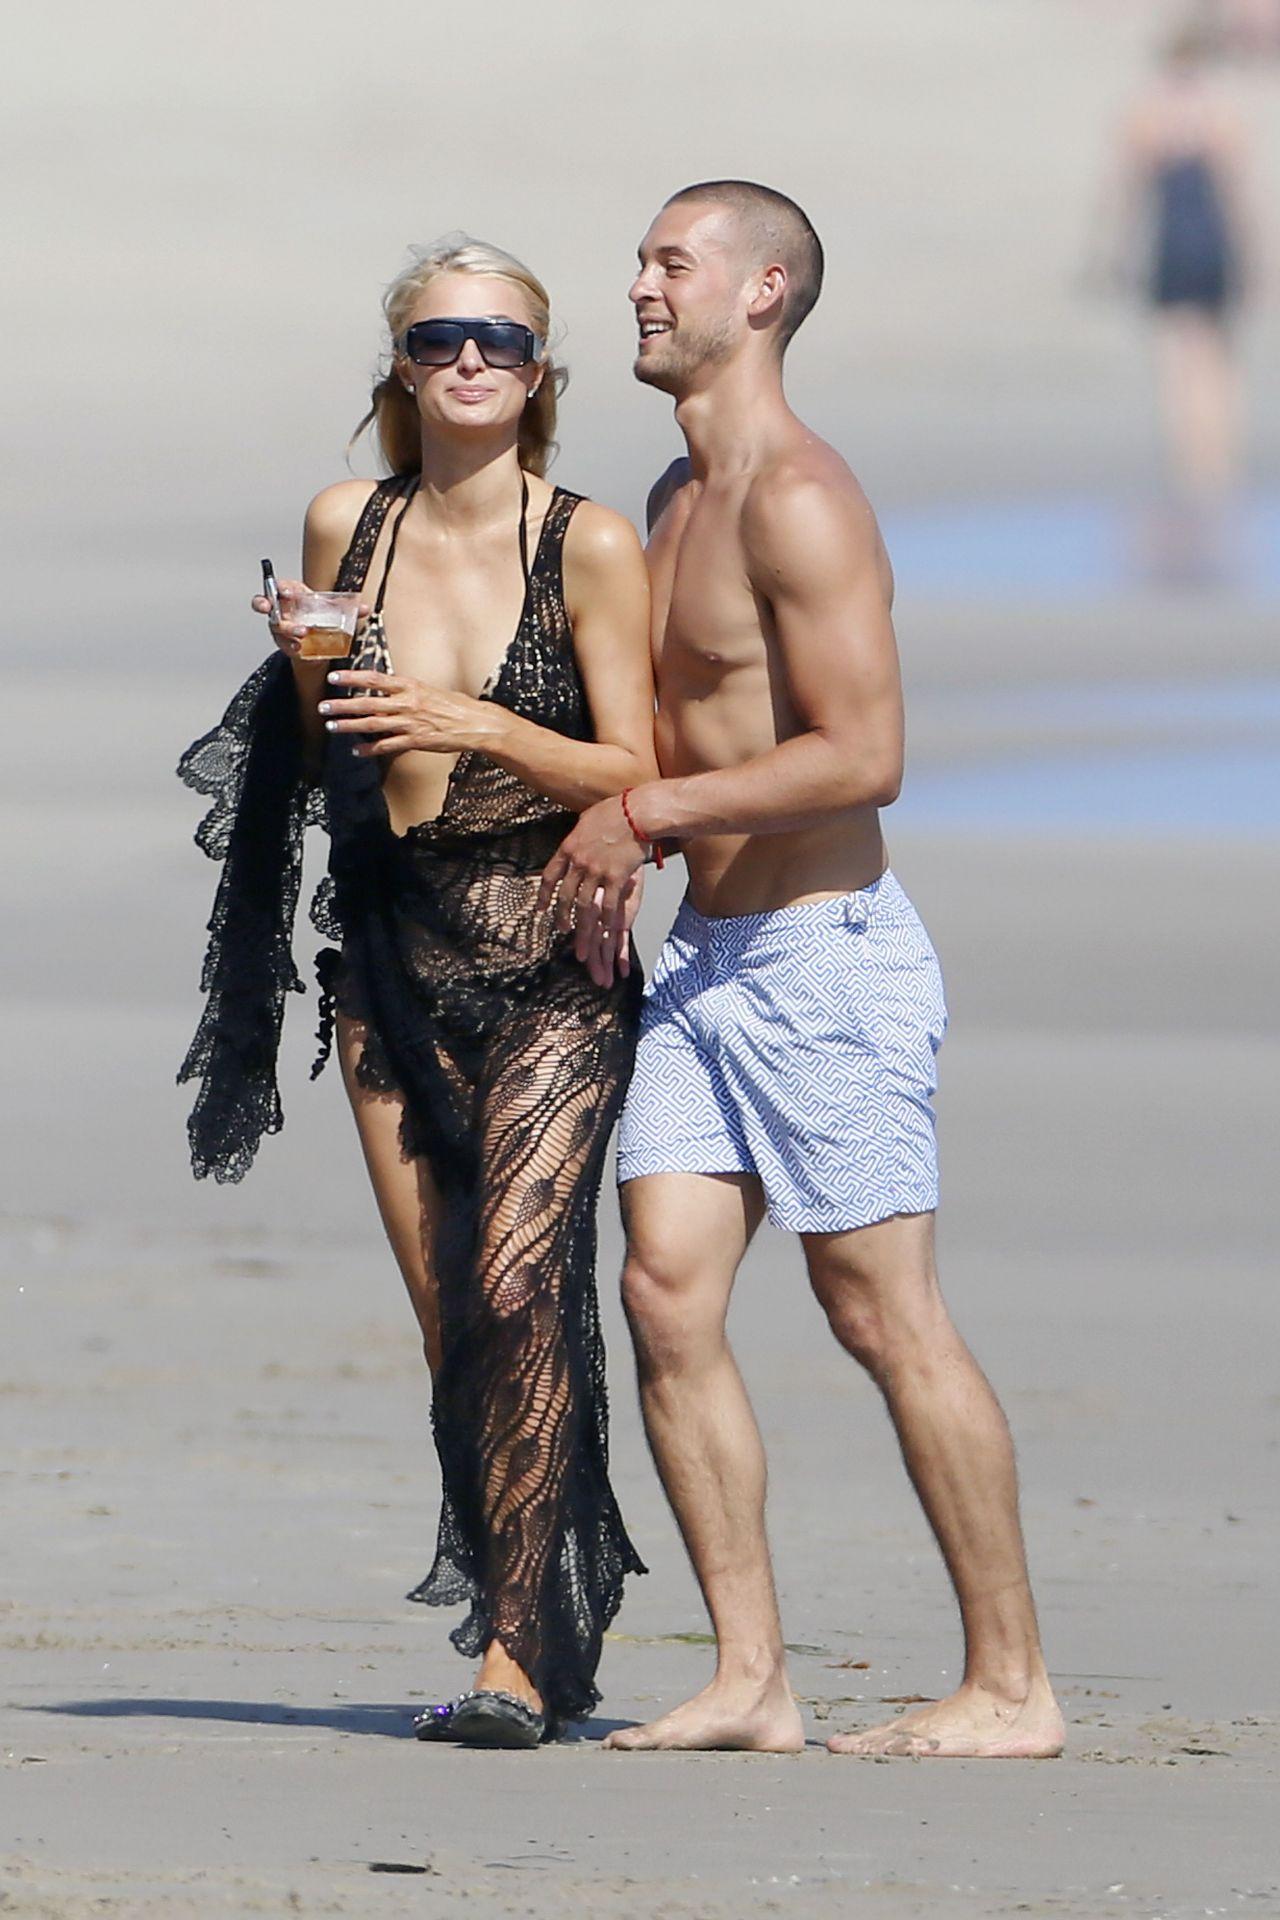 Paris Hilton In A Bikini On The Beach In Malibu July 2014